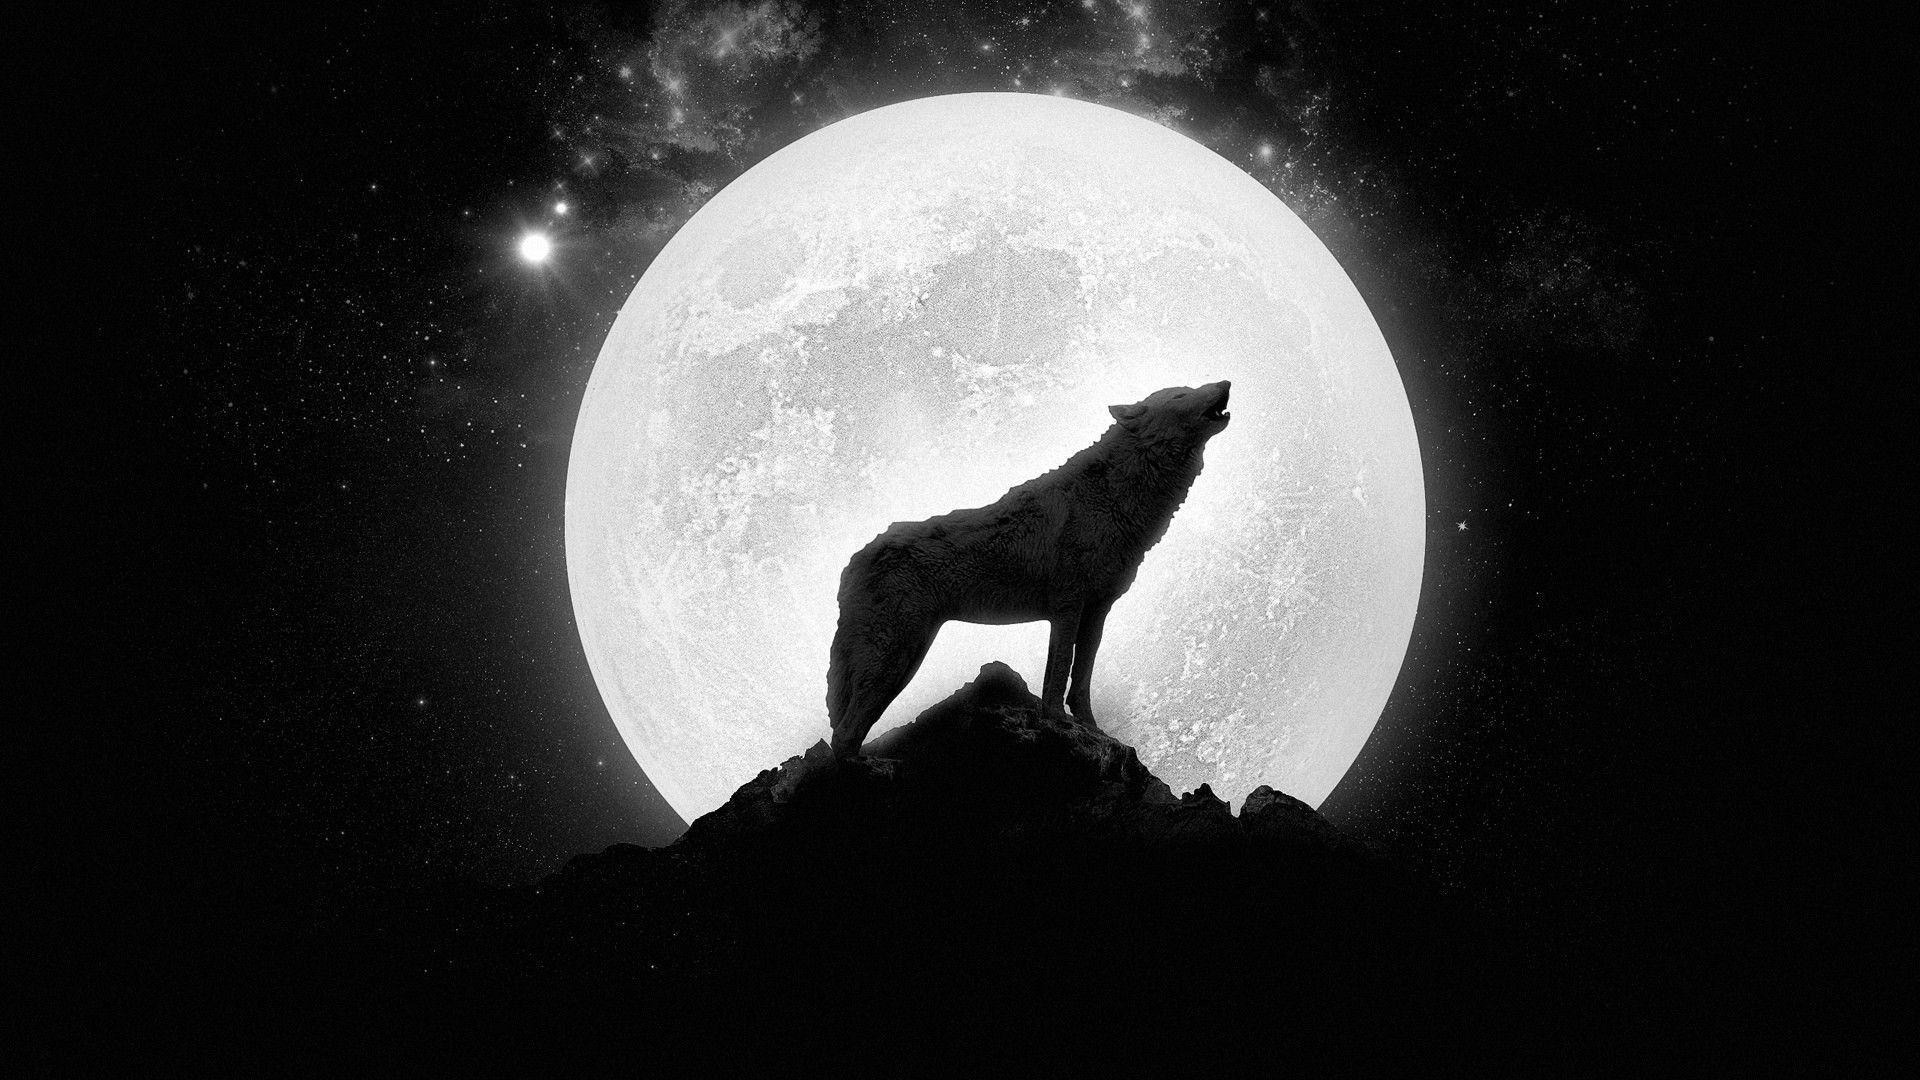 Howling Wolf Wallpaper Hd Resolution